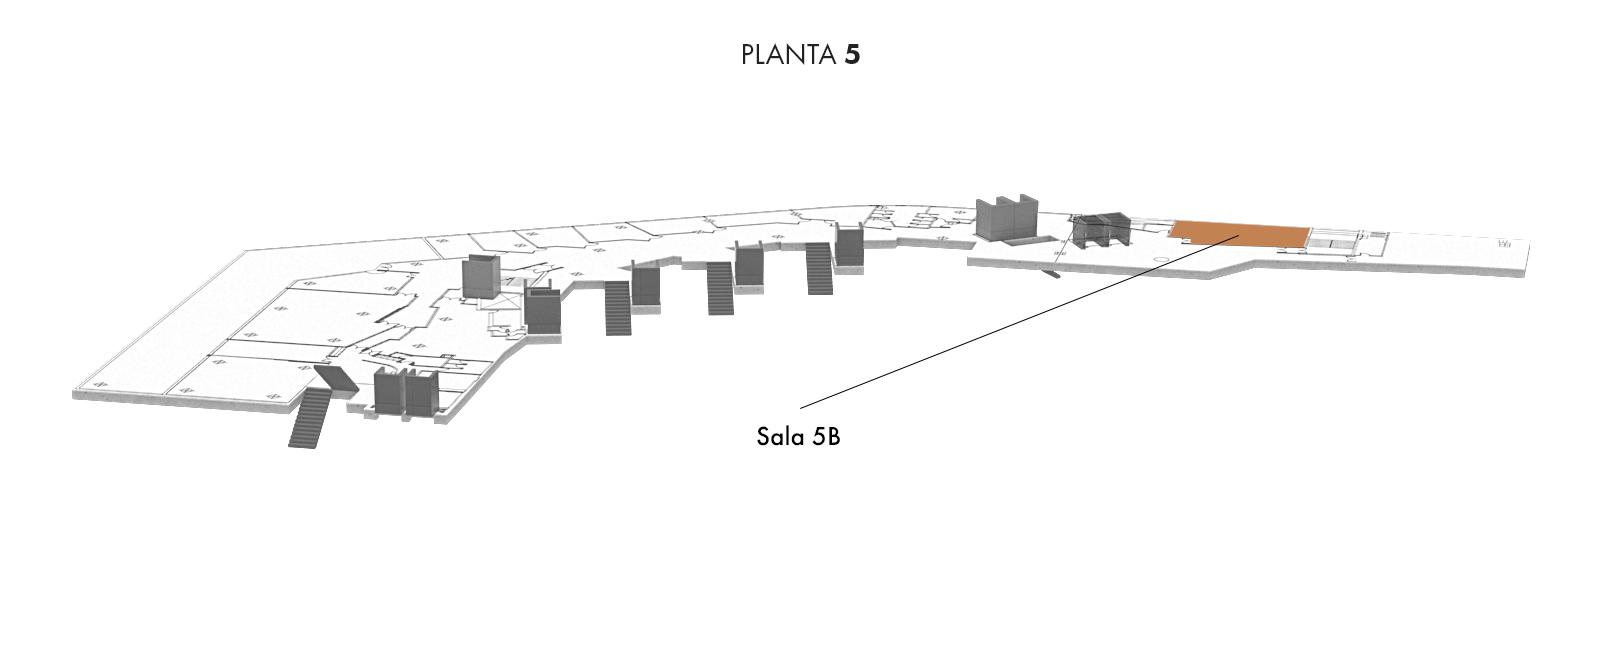 Sala 5B, Planta 5 | Palacio Euskalduna Jauregia